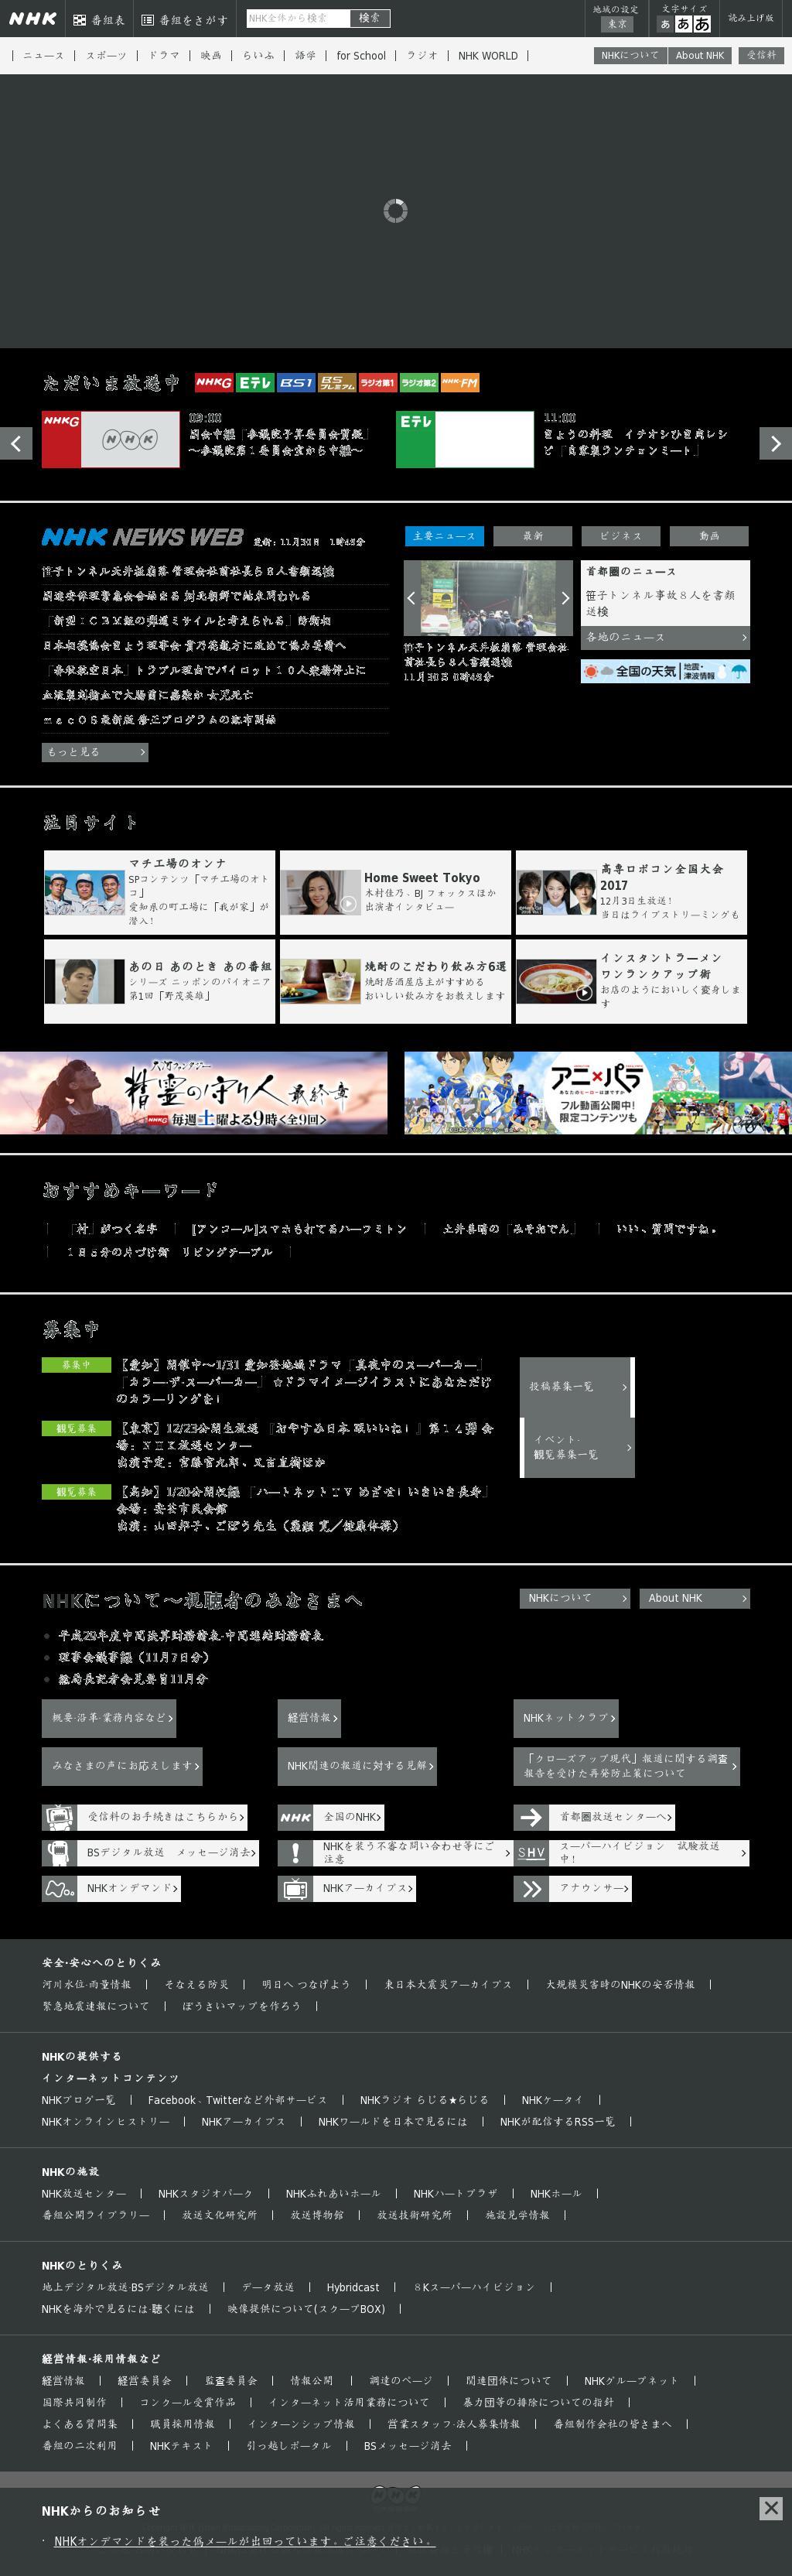 NHK Online at Wednesday Jan. 10, 2018, 12:15 p.m. UTC